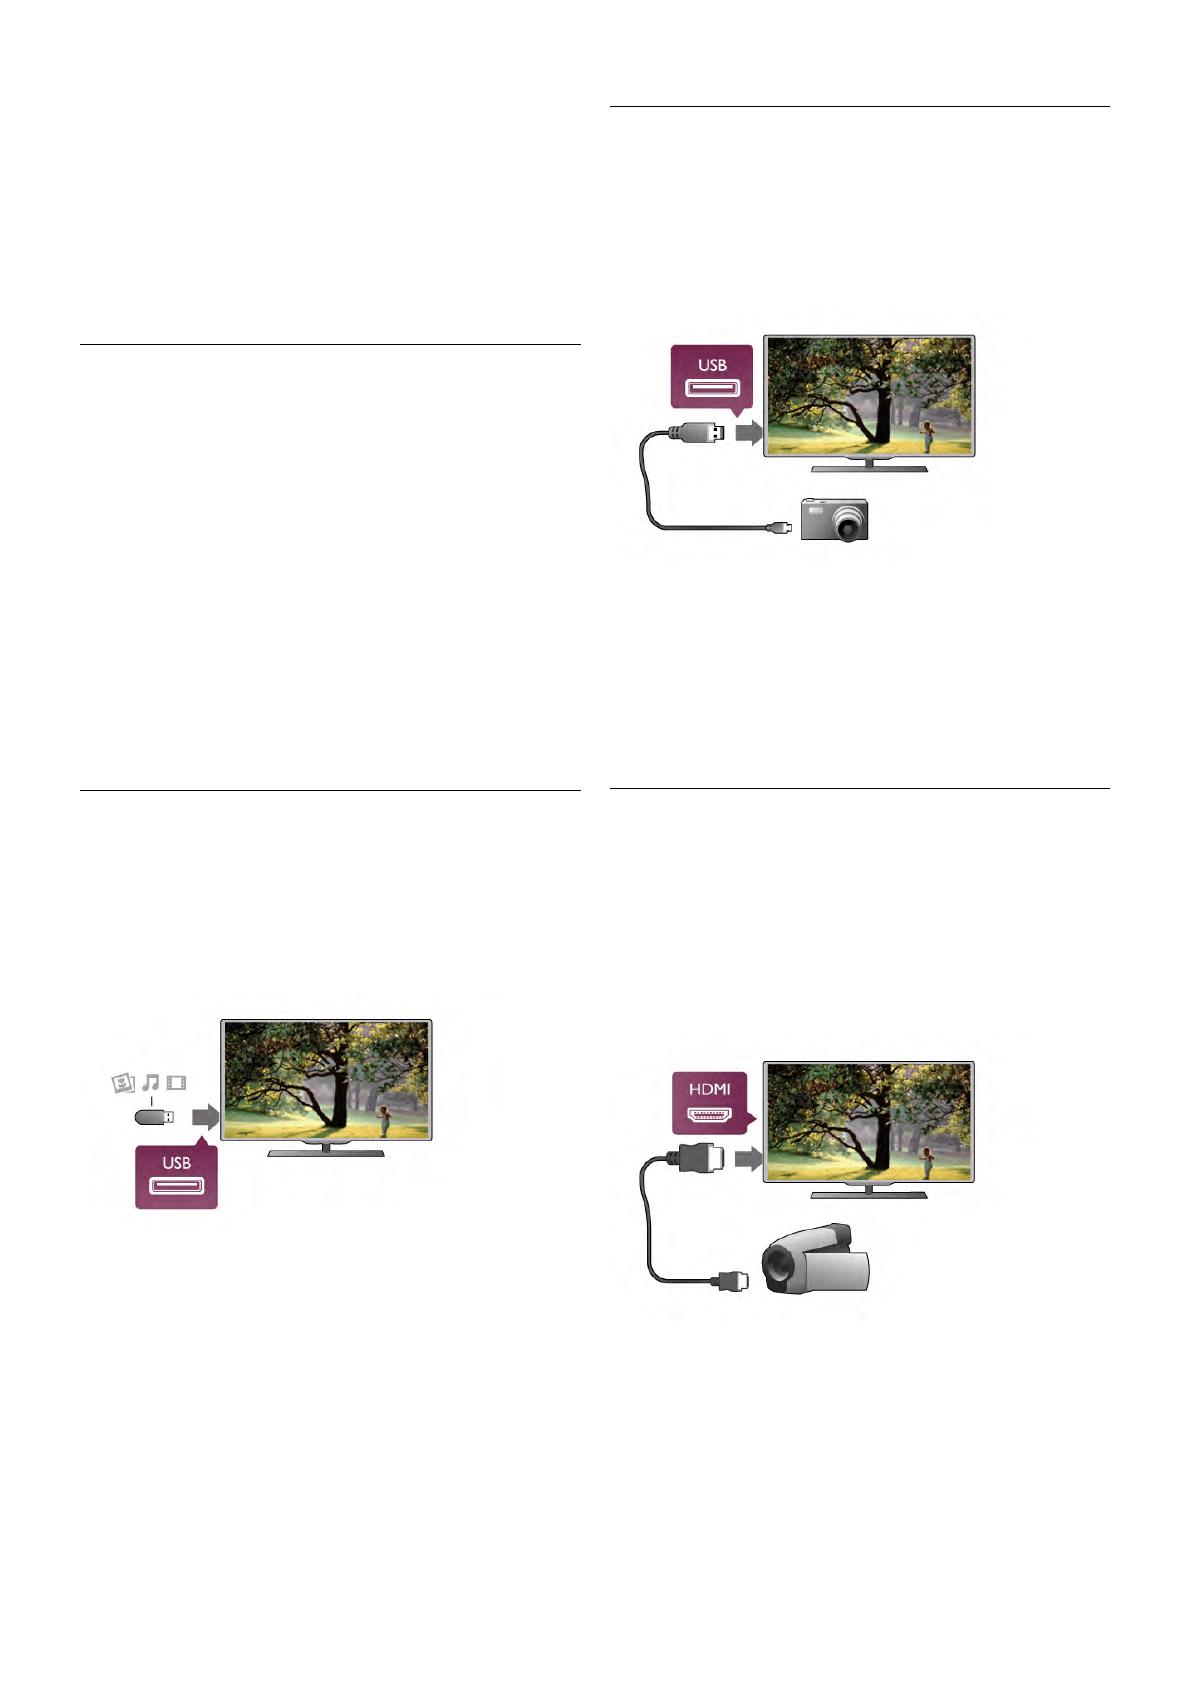 Philips 55PFL6678S/12 42 47 55PFL6xx8 User Manual